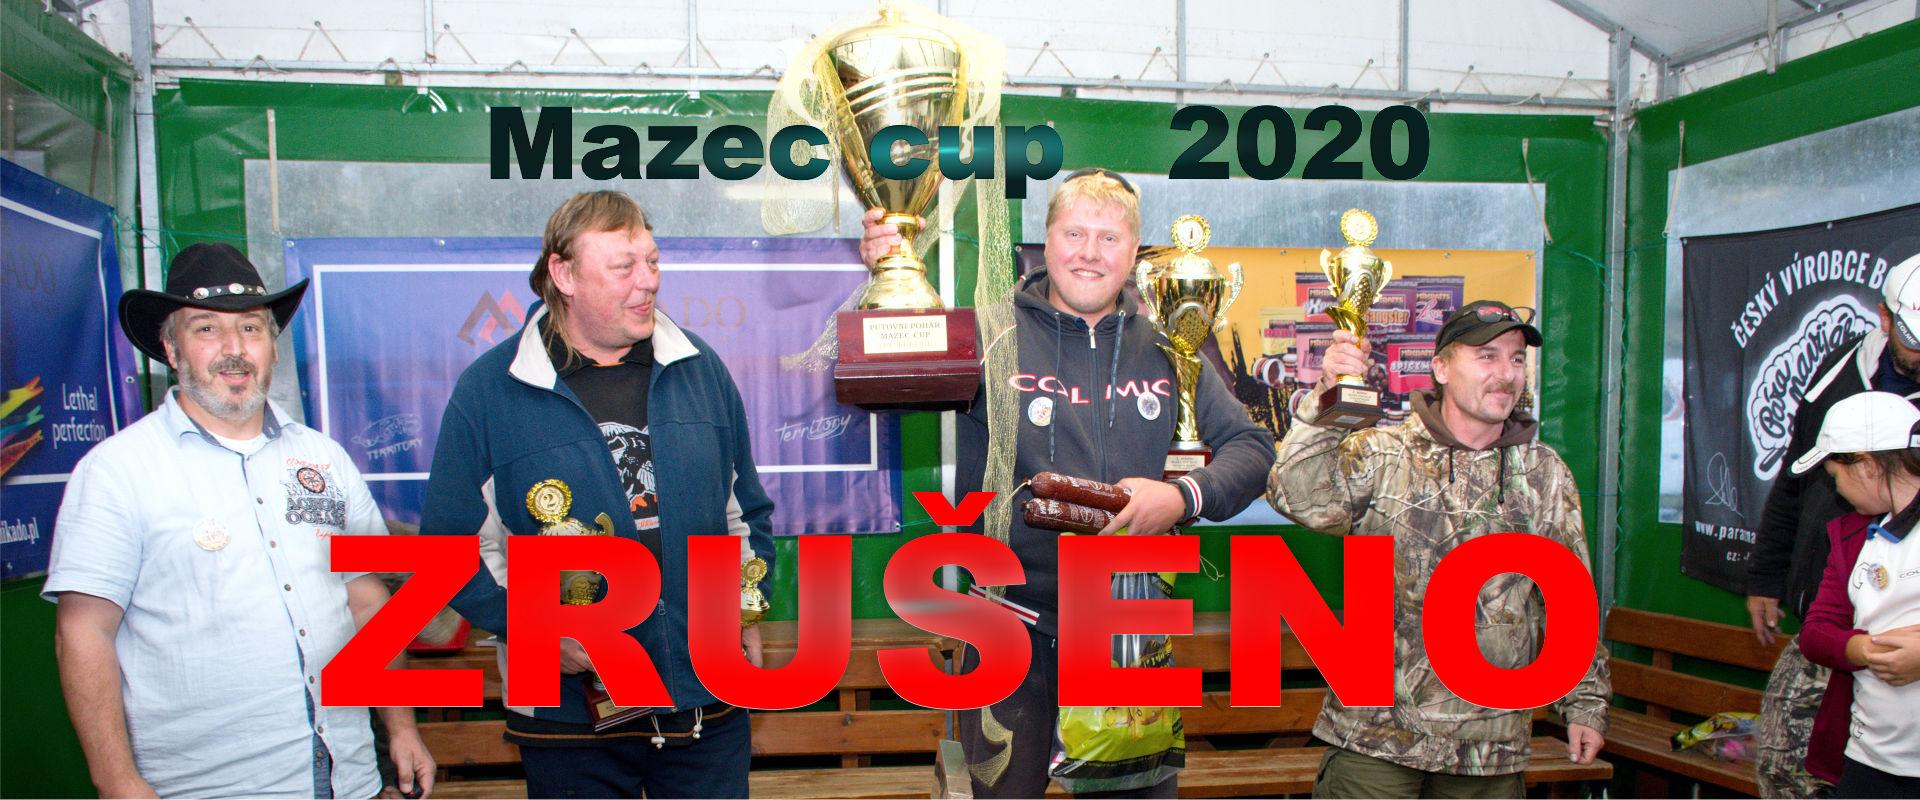 Mazec Cup 2020 - propozice